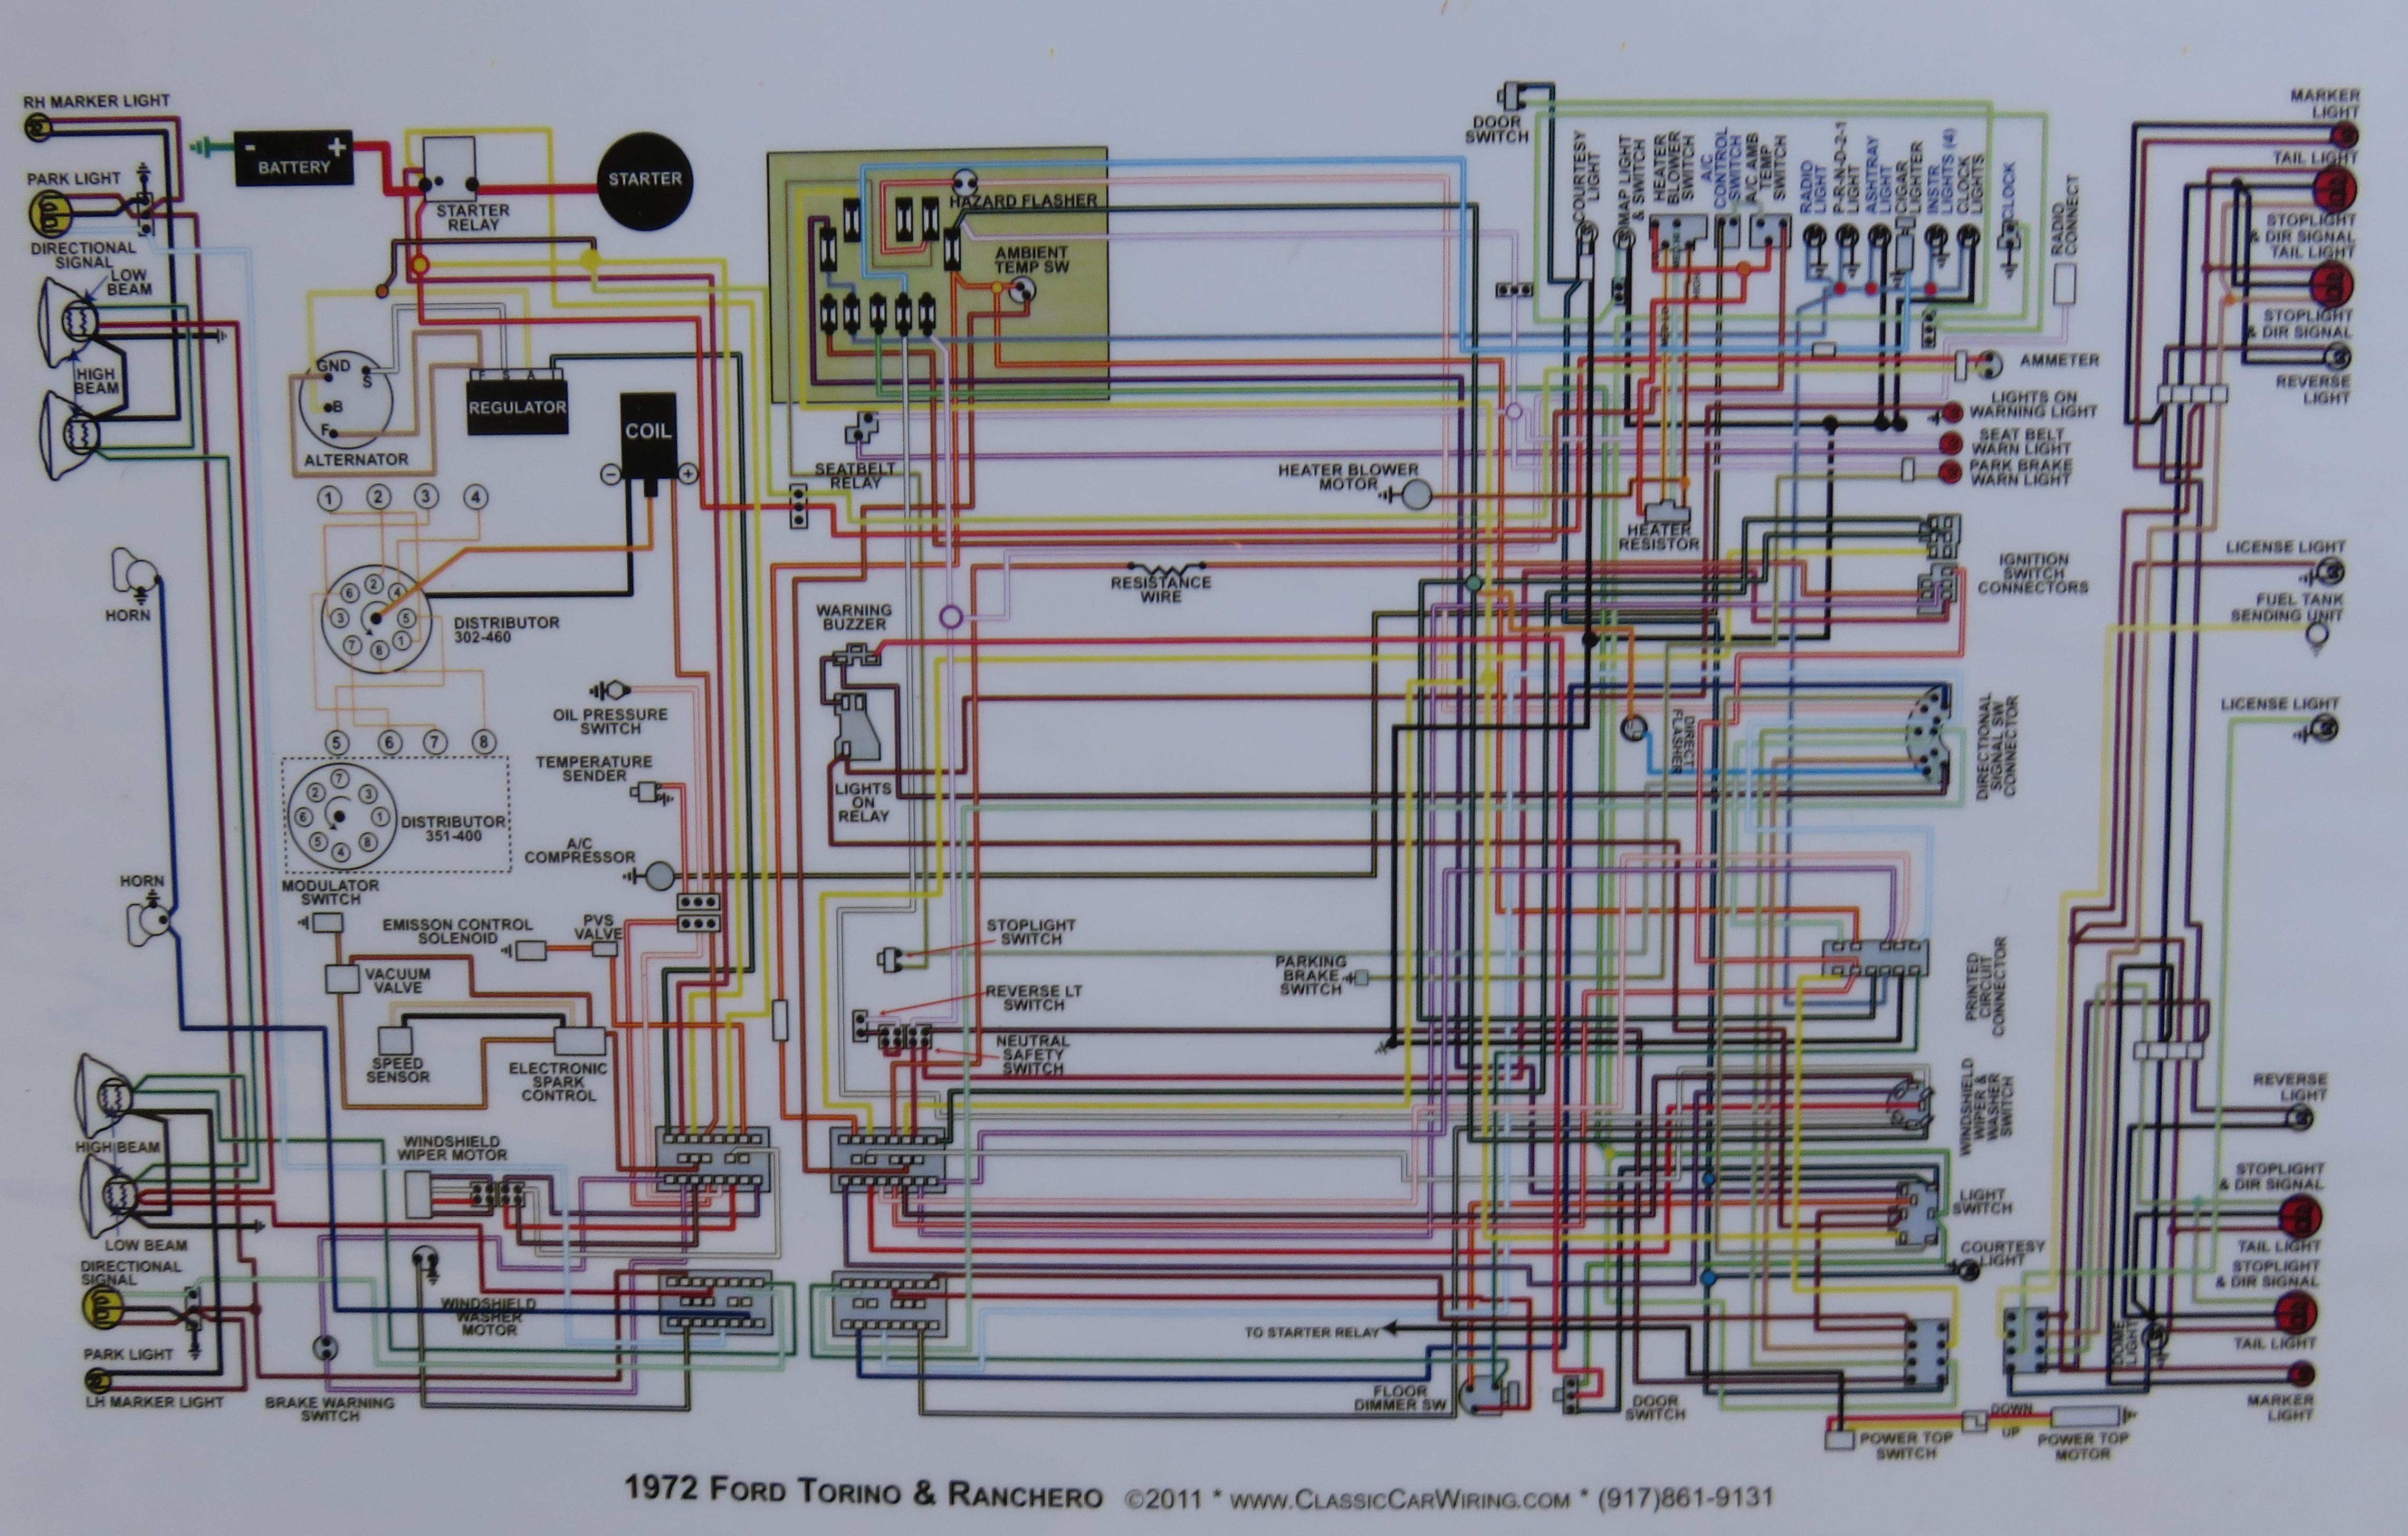 1931 cadillac wiring diagram wiring diagram expert 1931 cadillac wiring diagram [ 4564 x 2912 Pixel ]